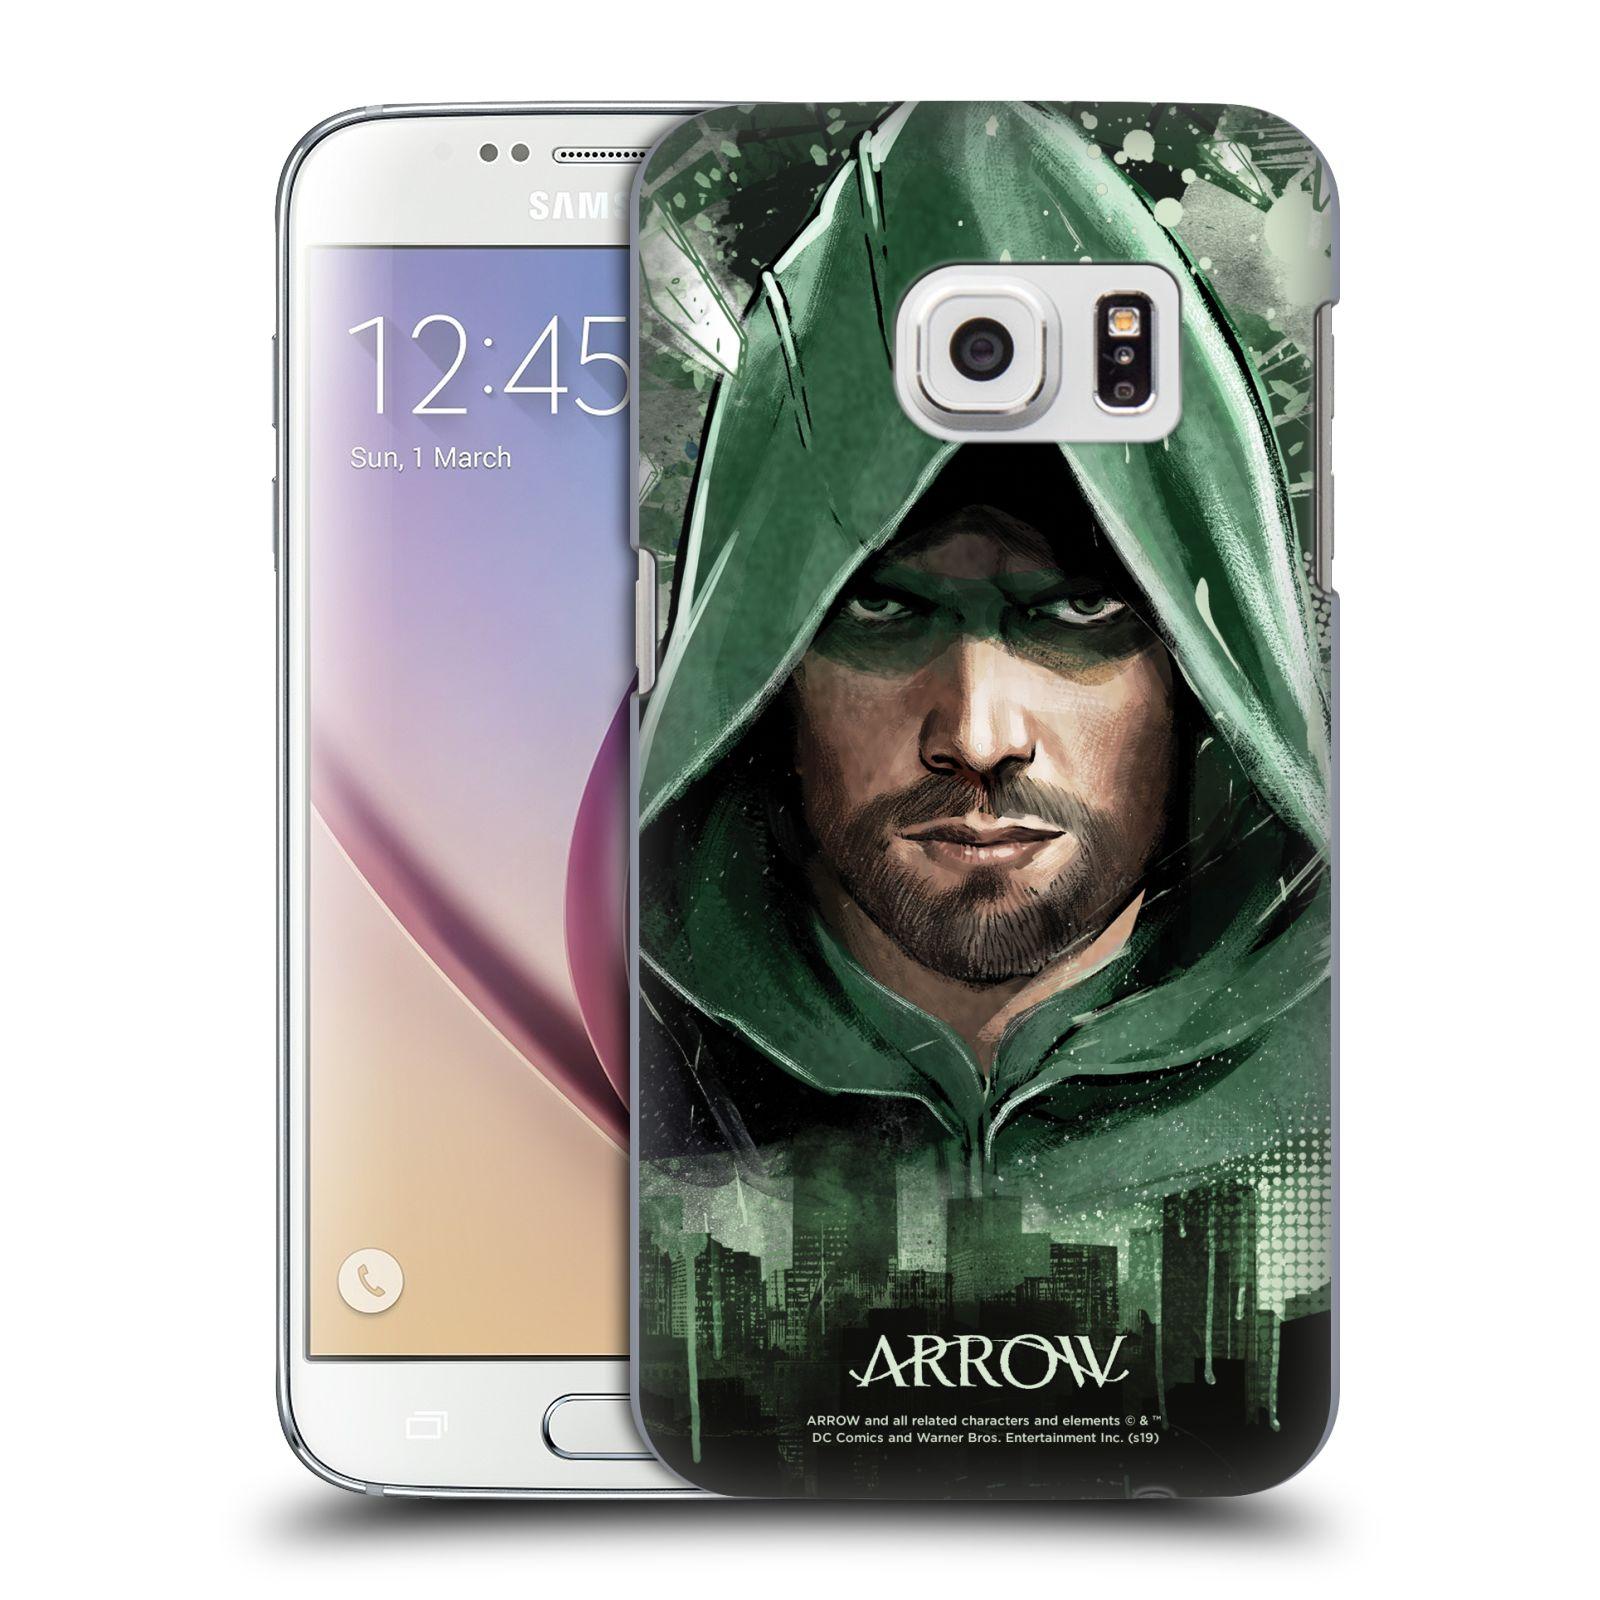 Pouzdro na mobil Samsung Galaxy S7 - HEAD CASE - Seriál Arrow - kreslený motiv